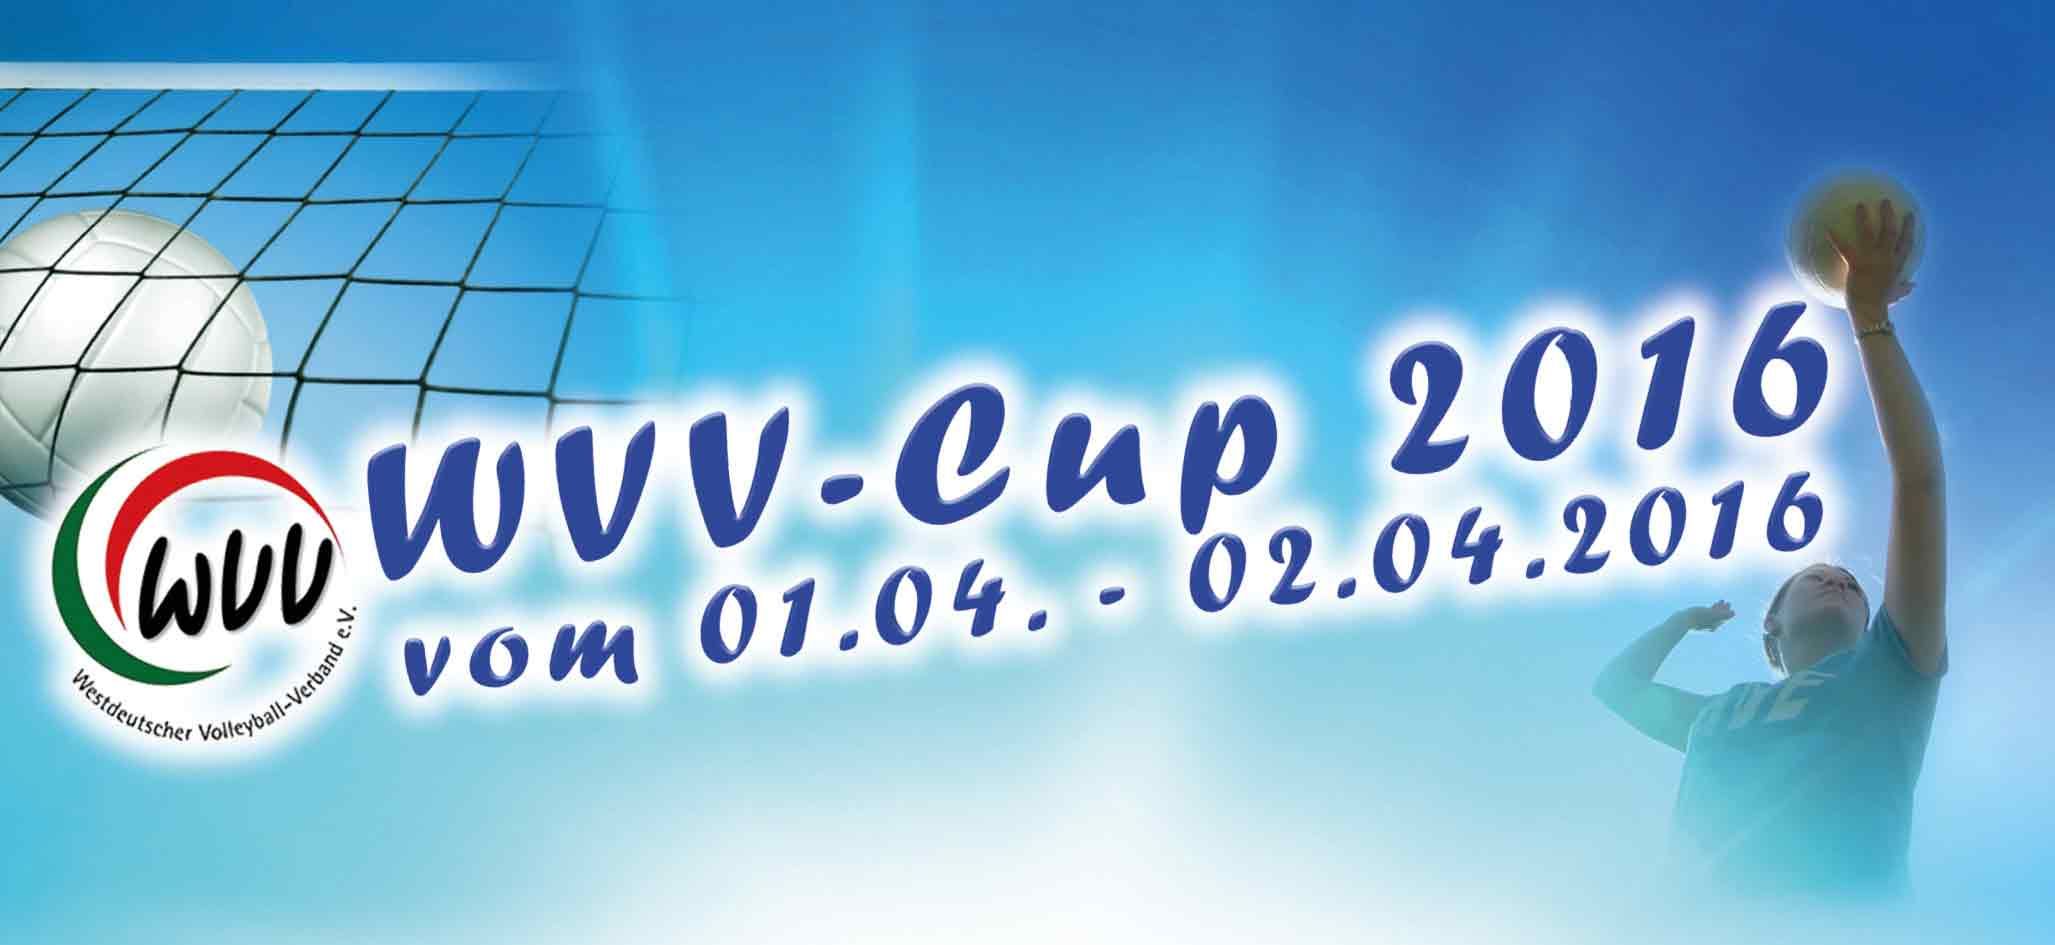 wvv16_web_cup